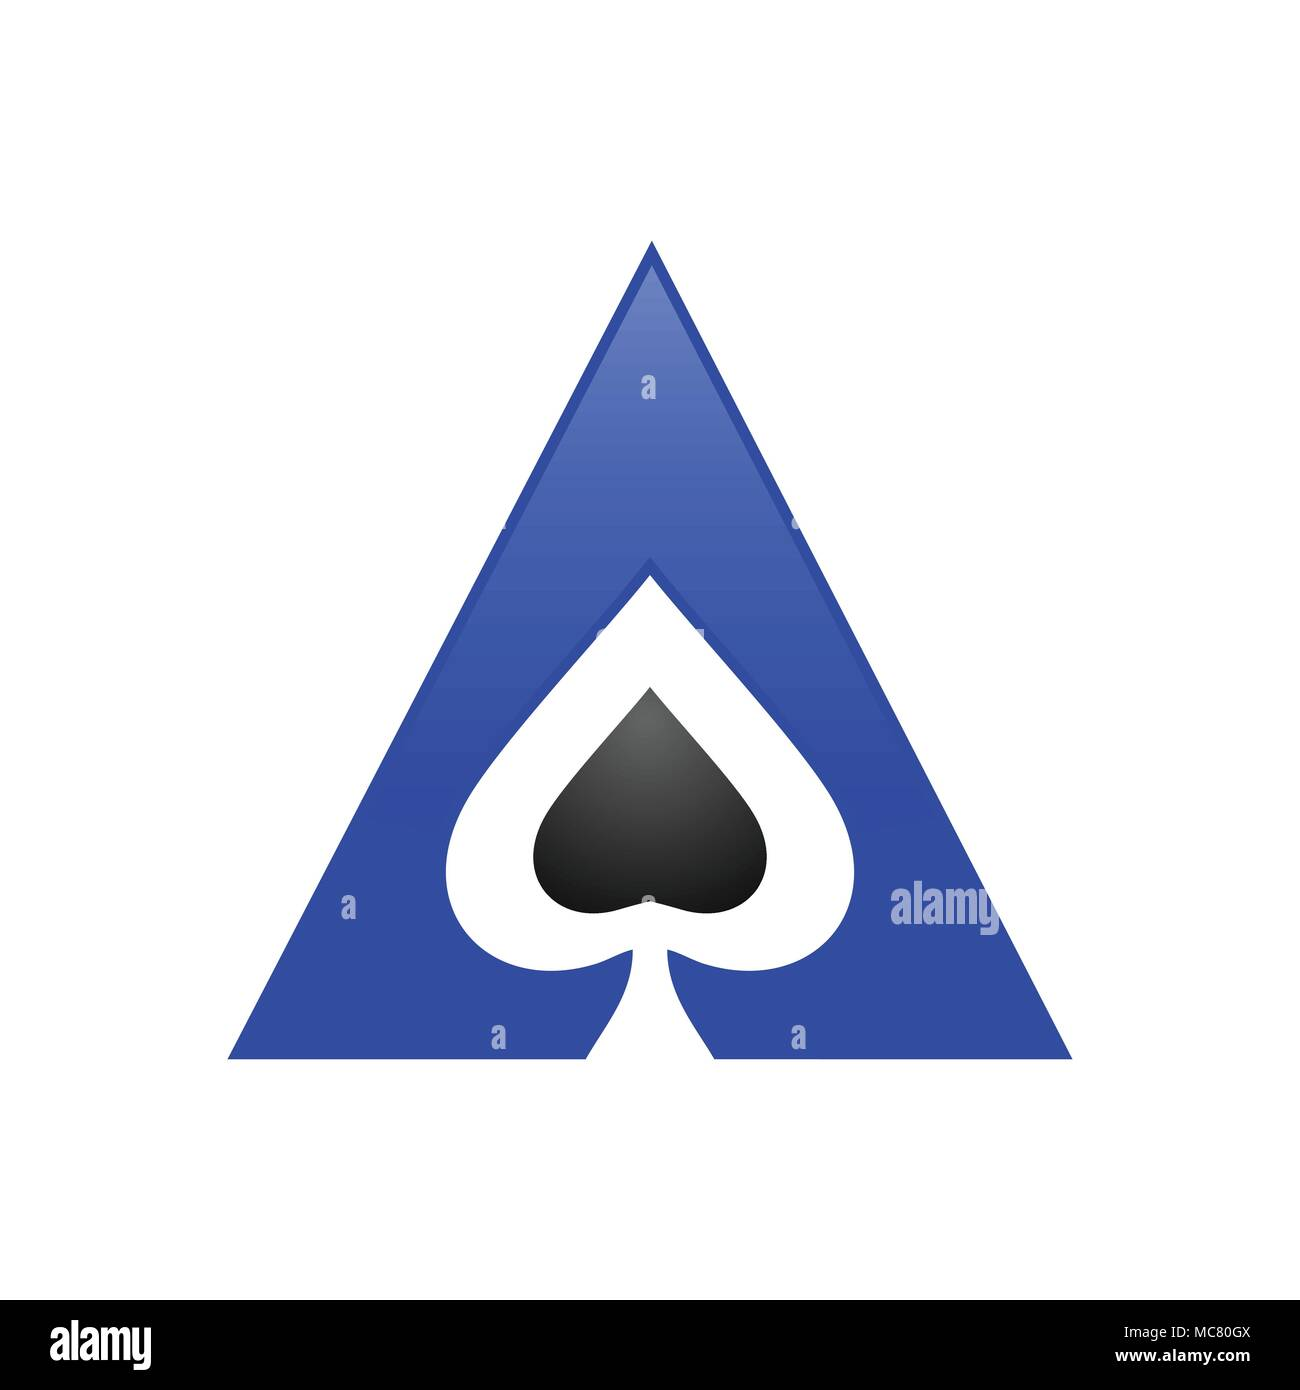 Spade Triangle Ace Symbole Vecteur Conception Logo Graphique Photo Stock